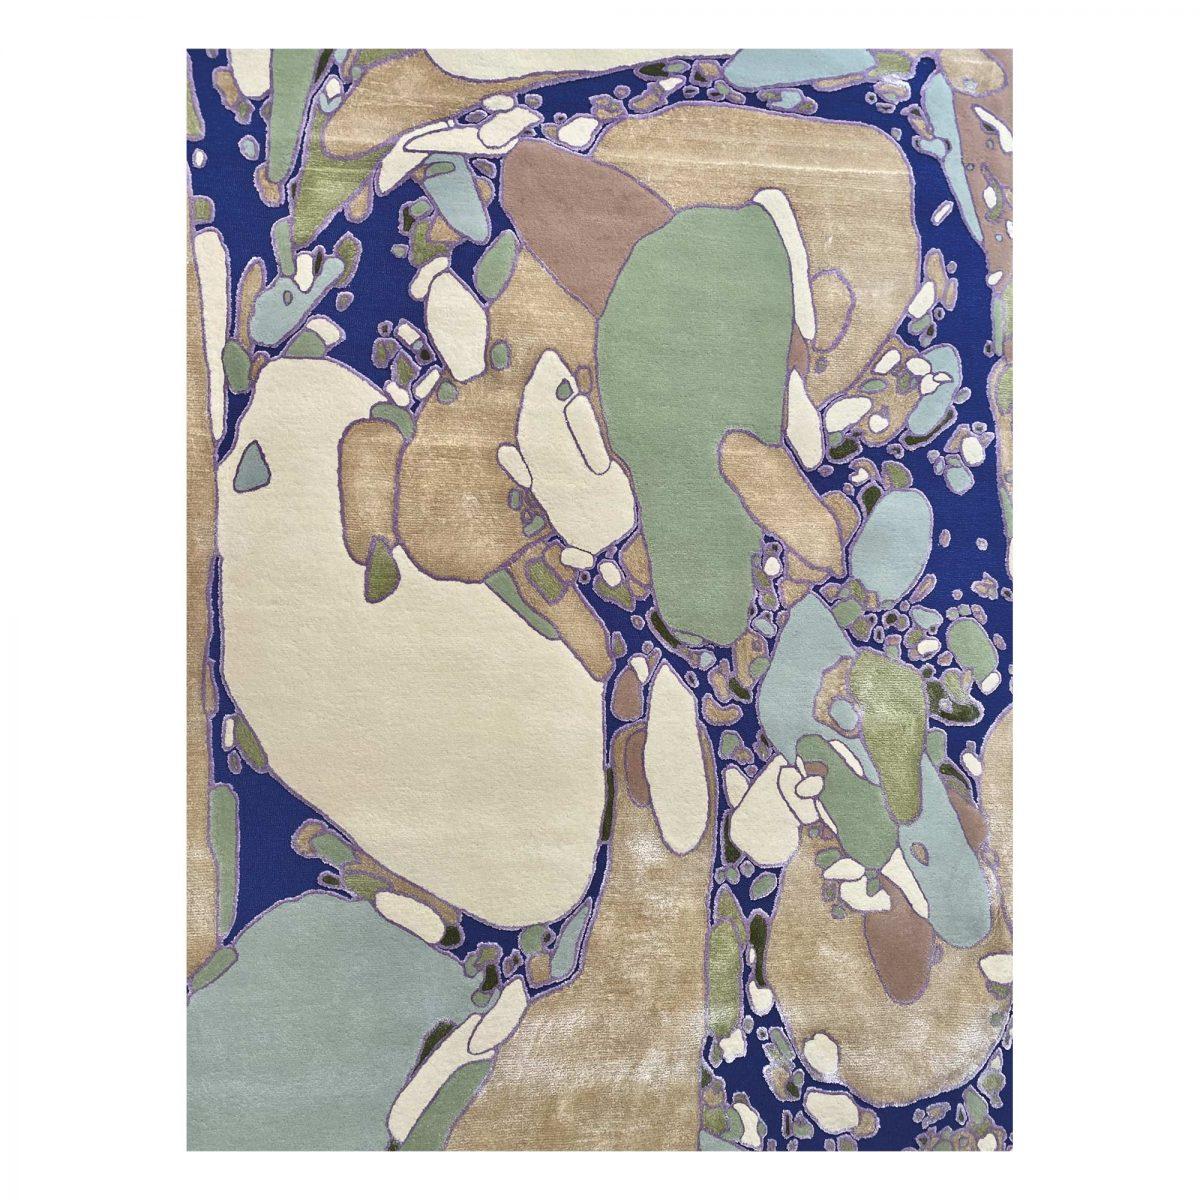 maison-dada-clement-vuillier-tapis-jardin-de-rocaille-02-rugs